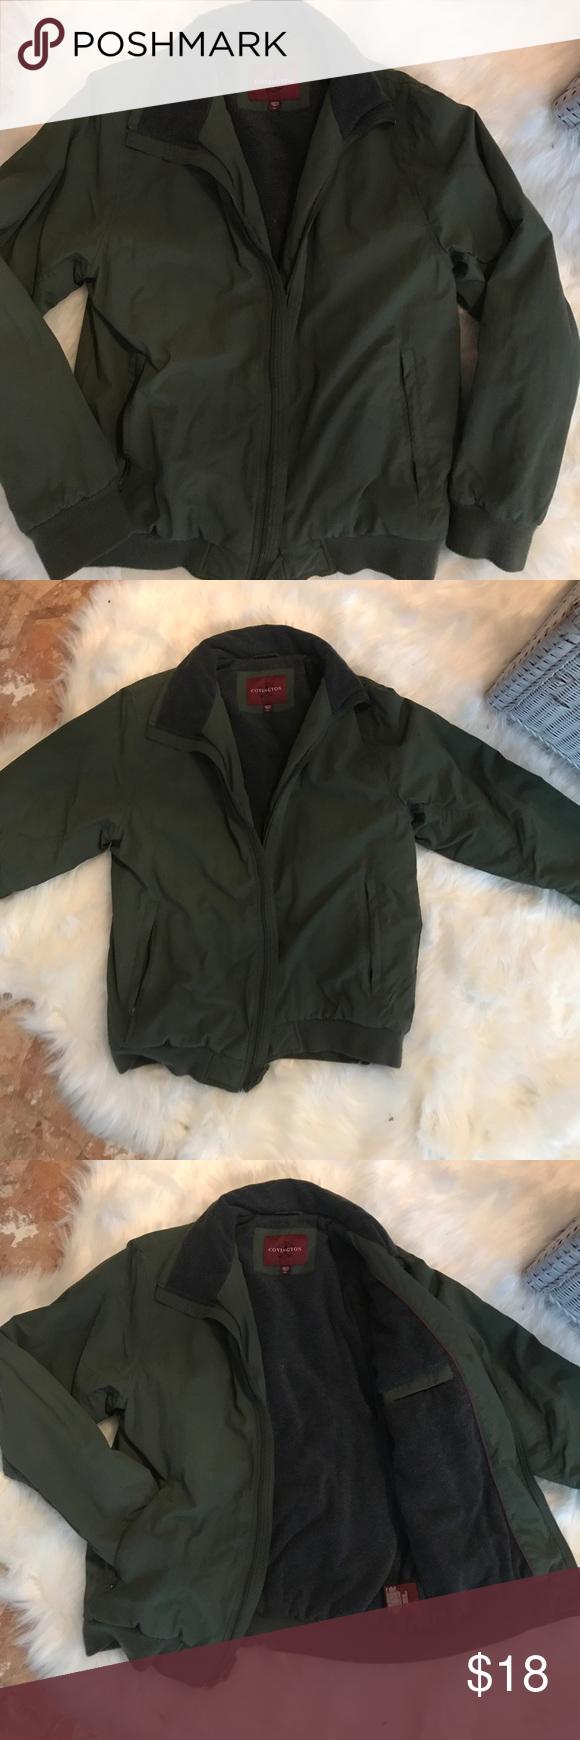 Covington Winter Jacket Very Nice Jacket Worn Very Little No Flaws Covington Jackets Coats Bomber Varsity Clothes Design Cool Jackets Winter Jackets [ 1740 x 580 Pixel ]